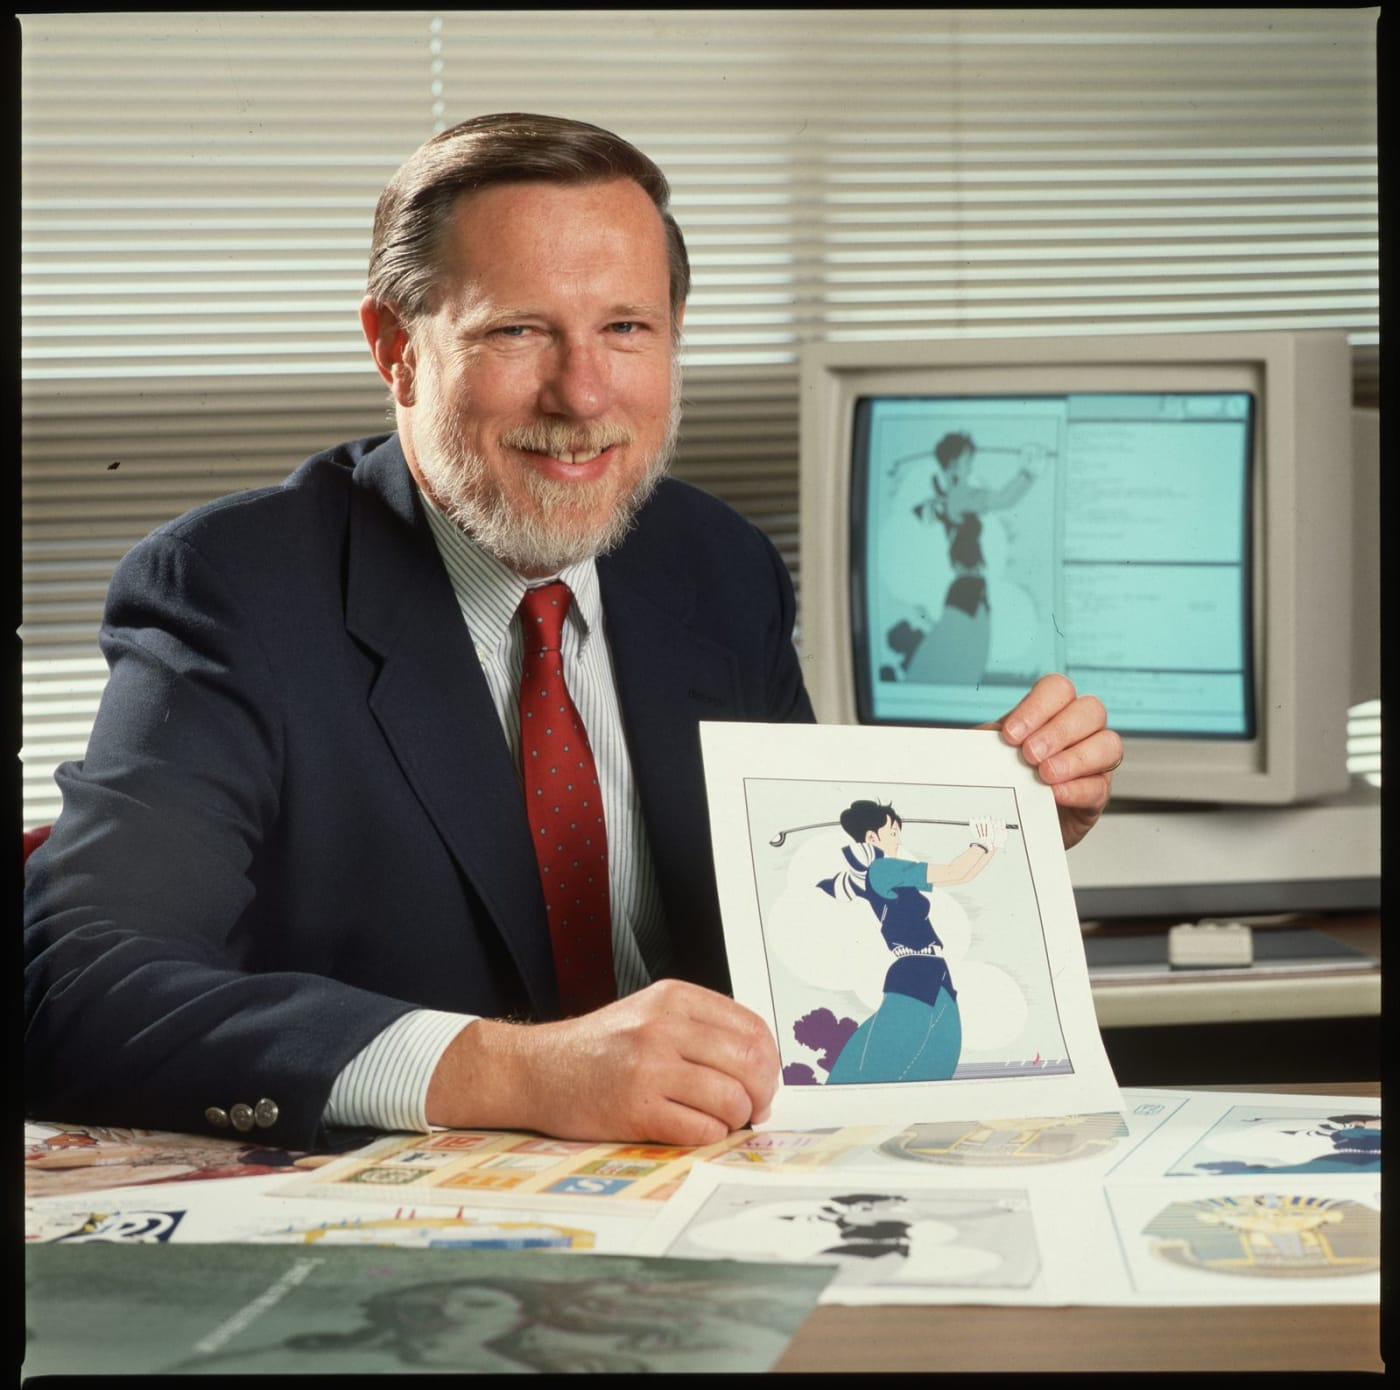 Founder of Adobe